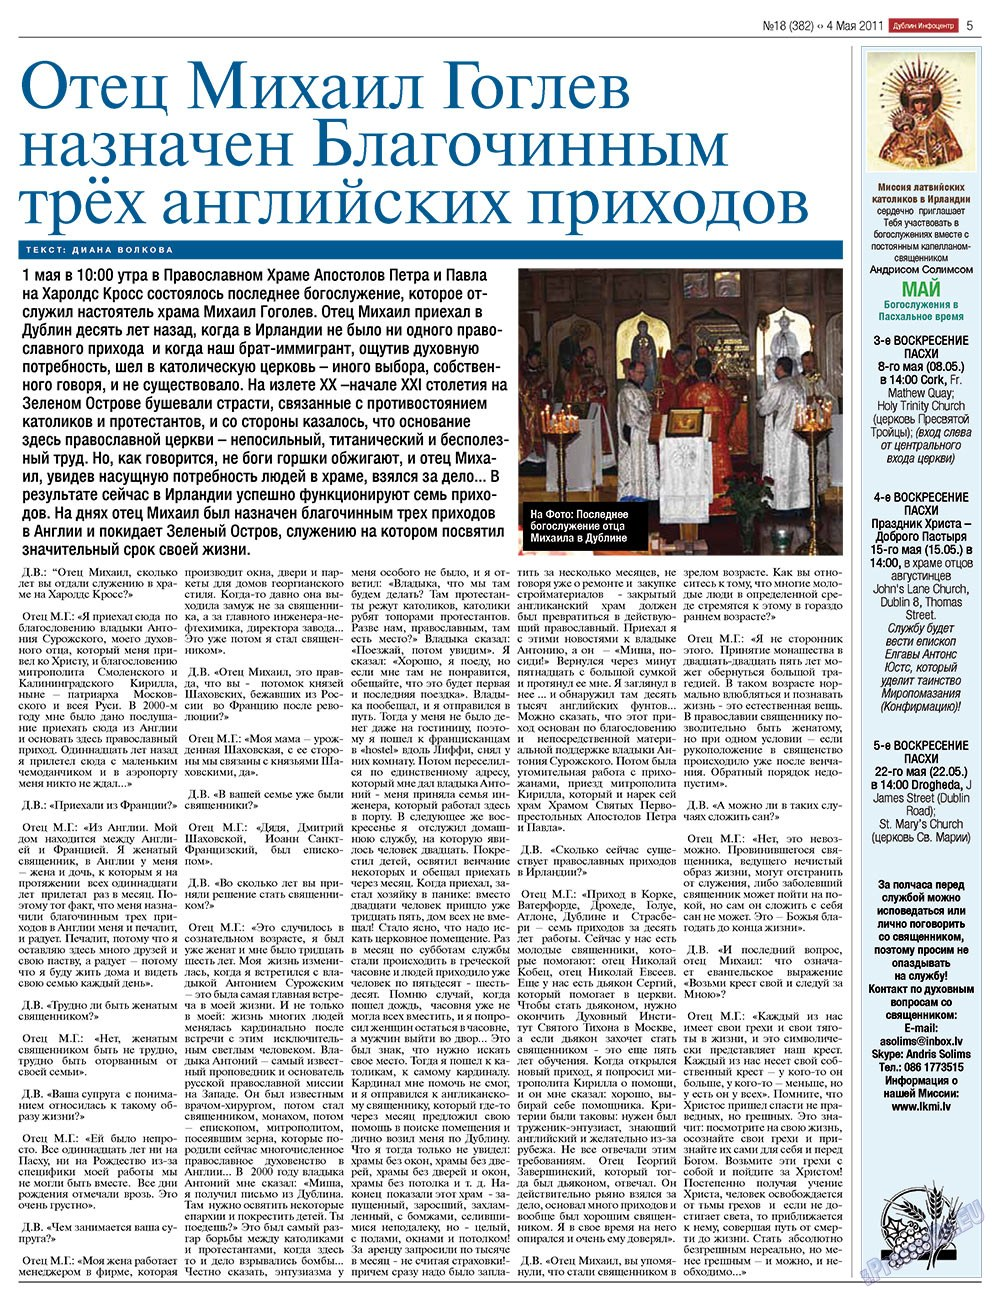 Дублин инфоцентр (газета). 2011 год, номер 18, стр. 5